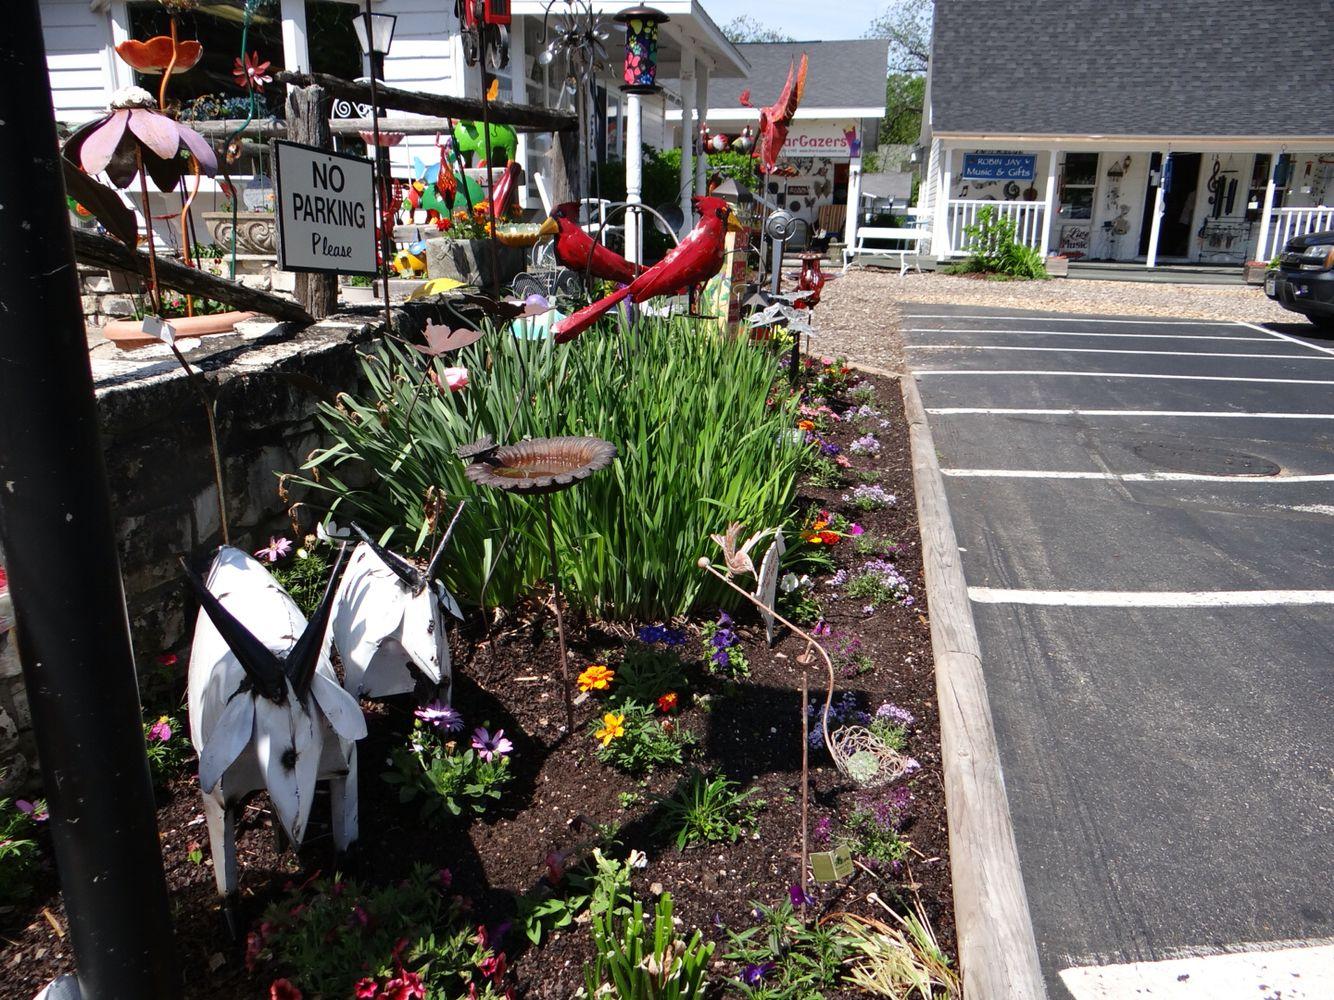 Sun Garden Gartenmobel ~ Sunshine and company garden and gift shop in founder s square fish